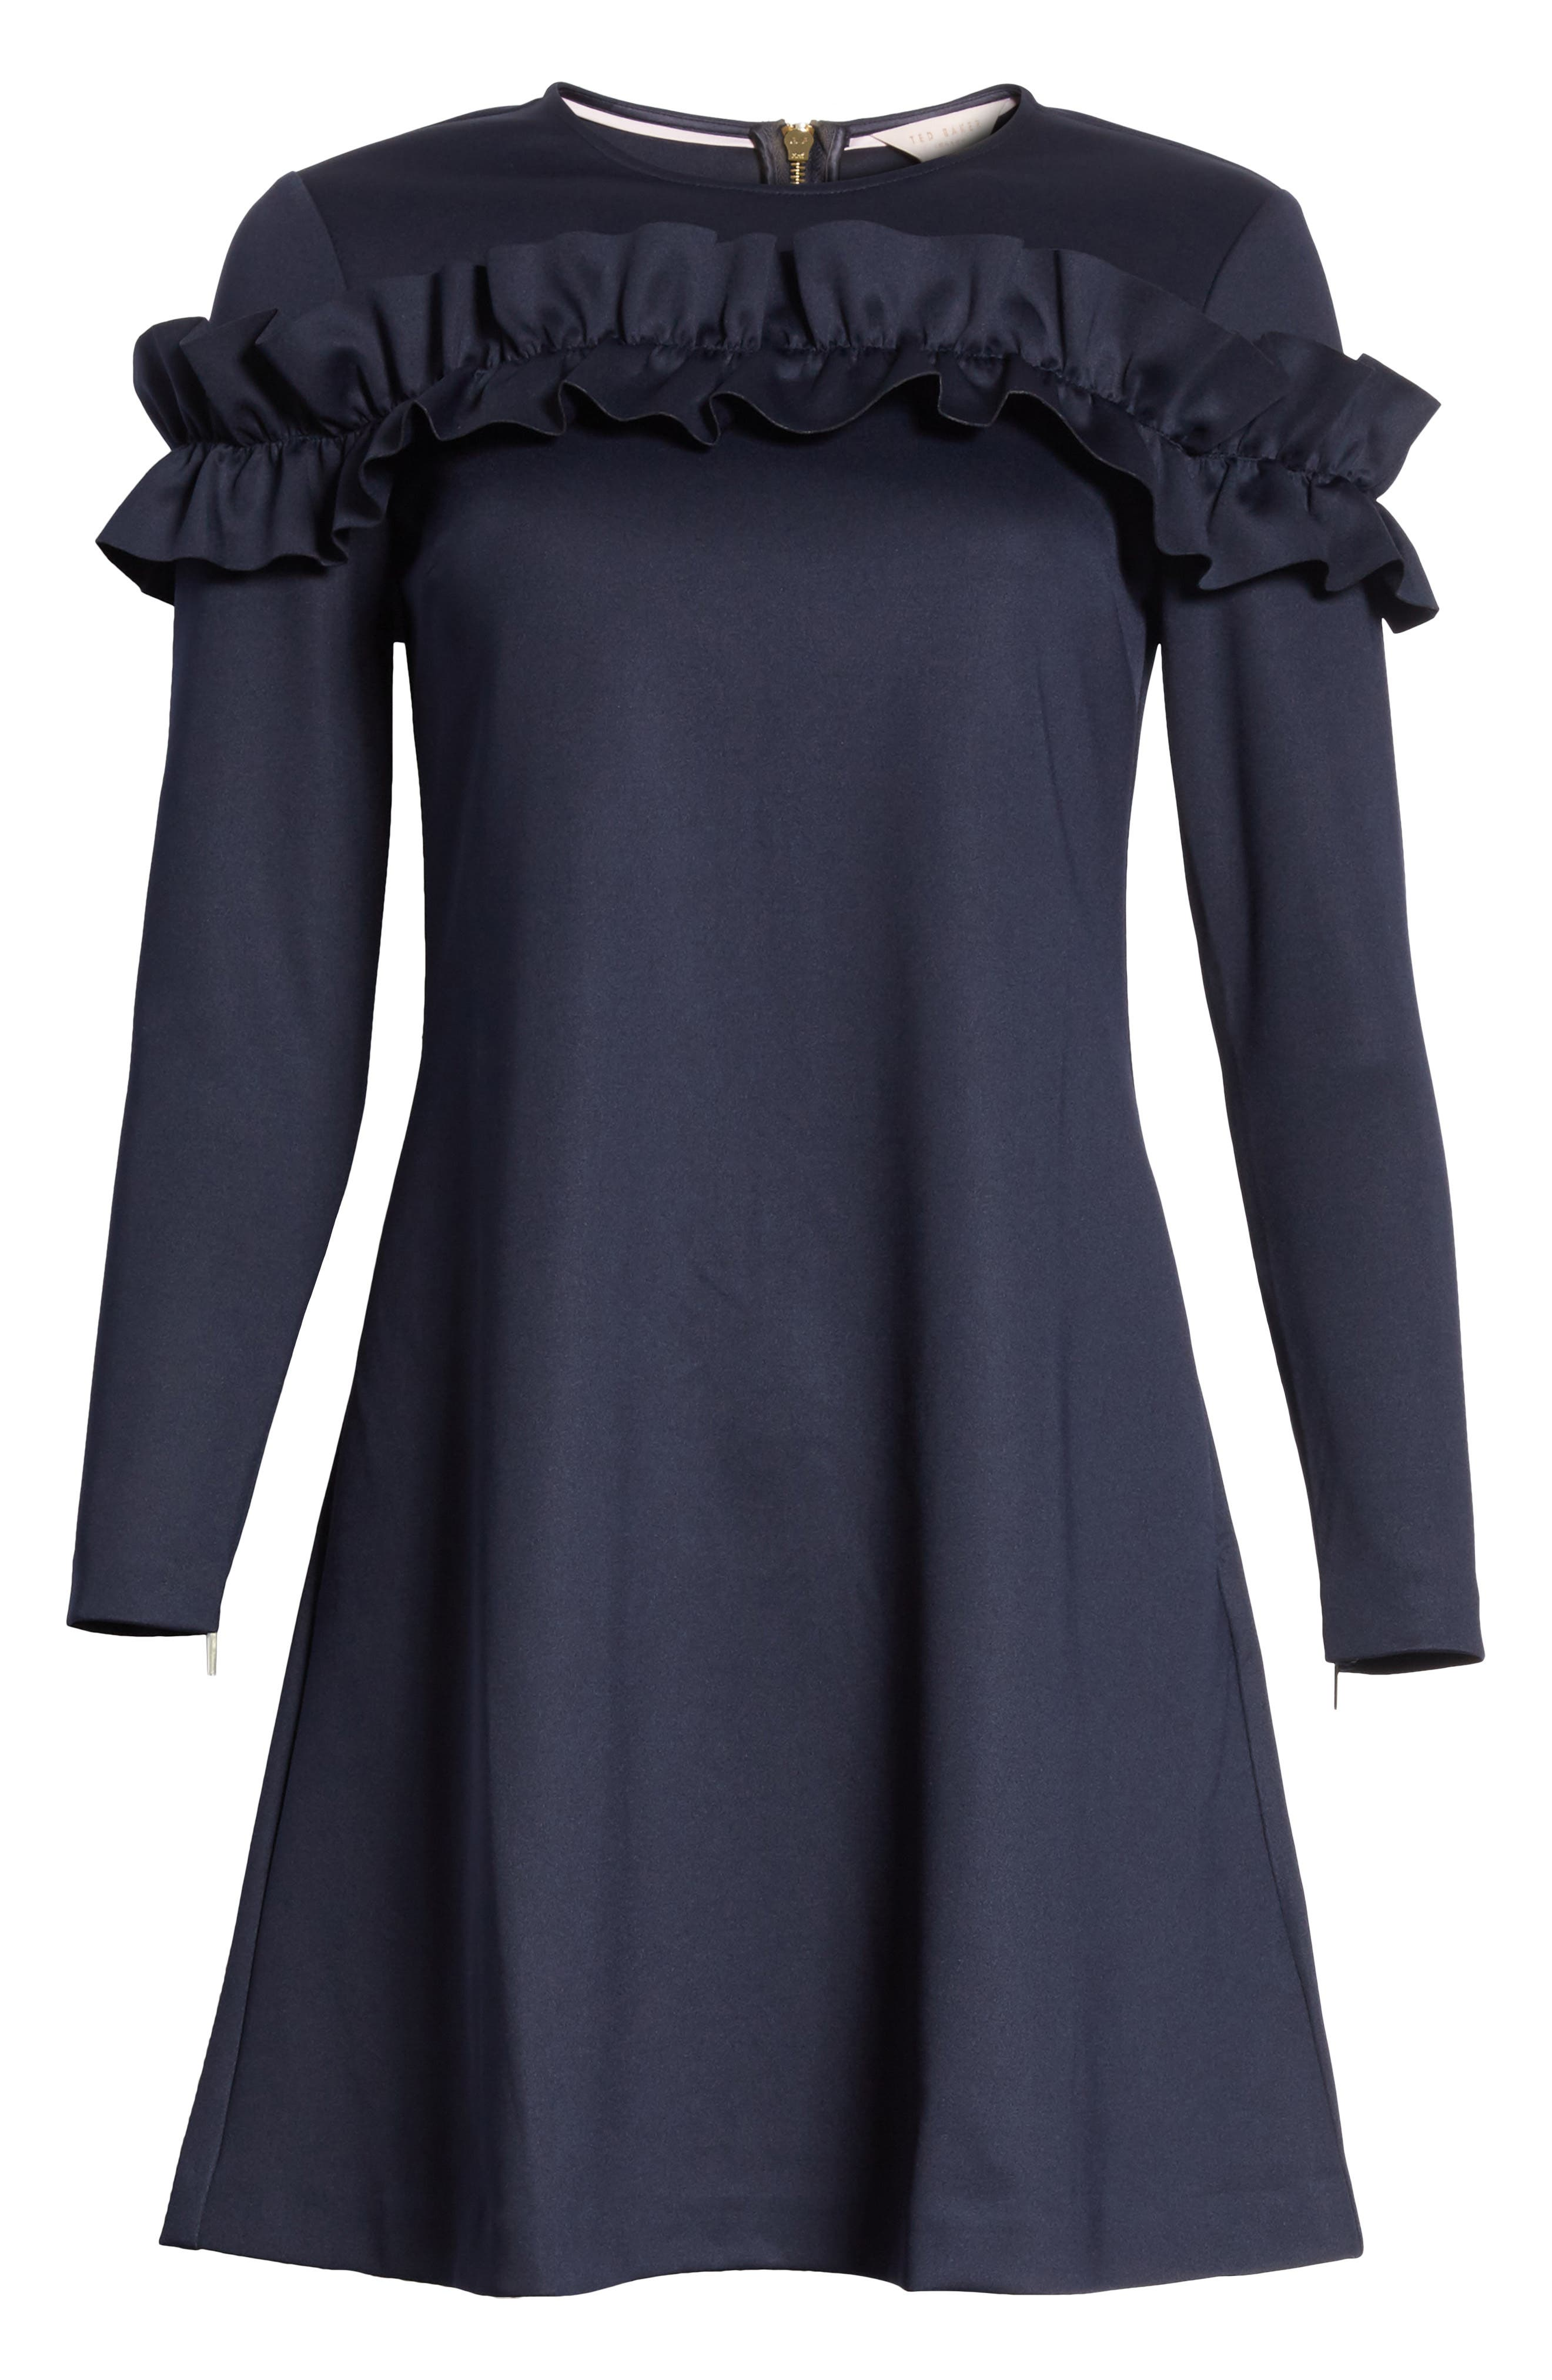 Ruffle Bodice Tunic Dress,                             Alternate thumbnail 6, color,                             402